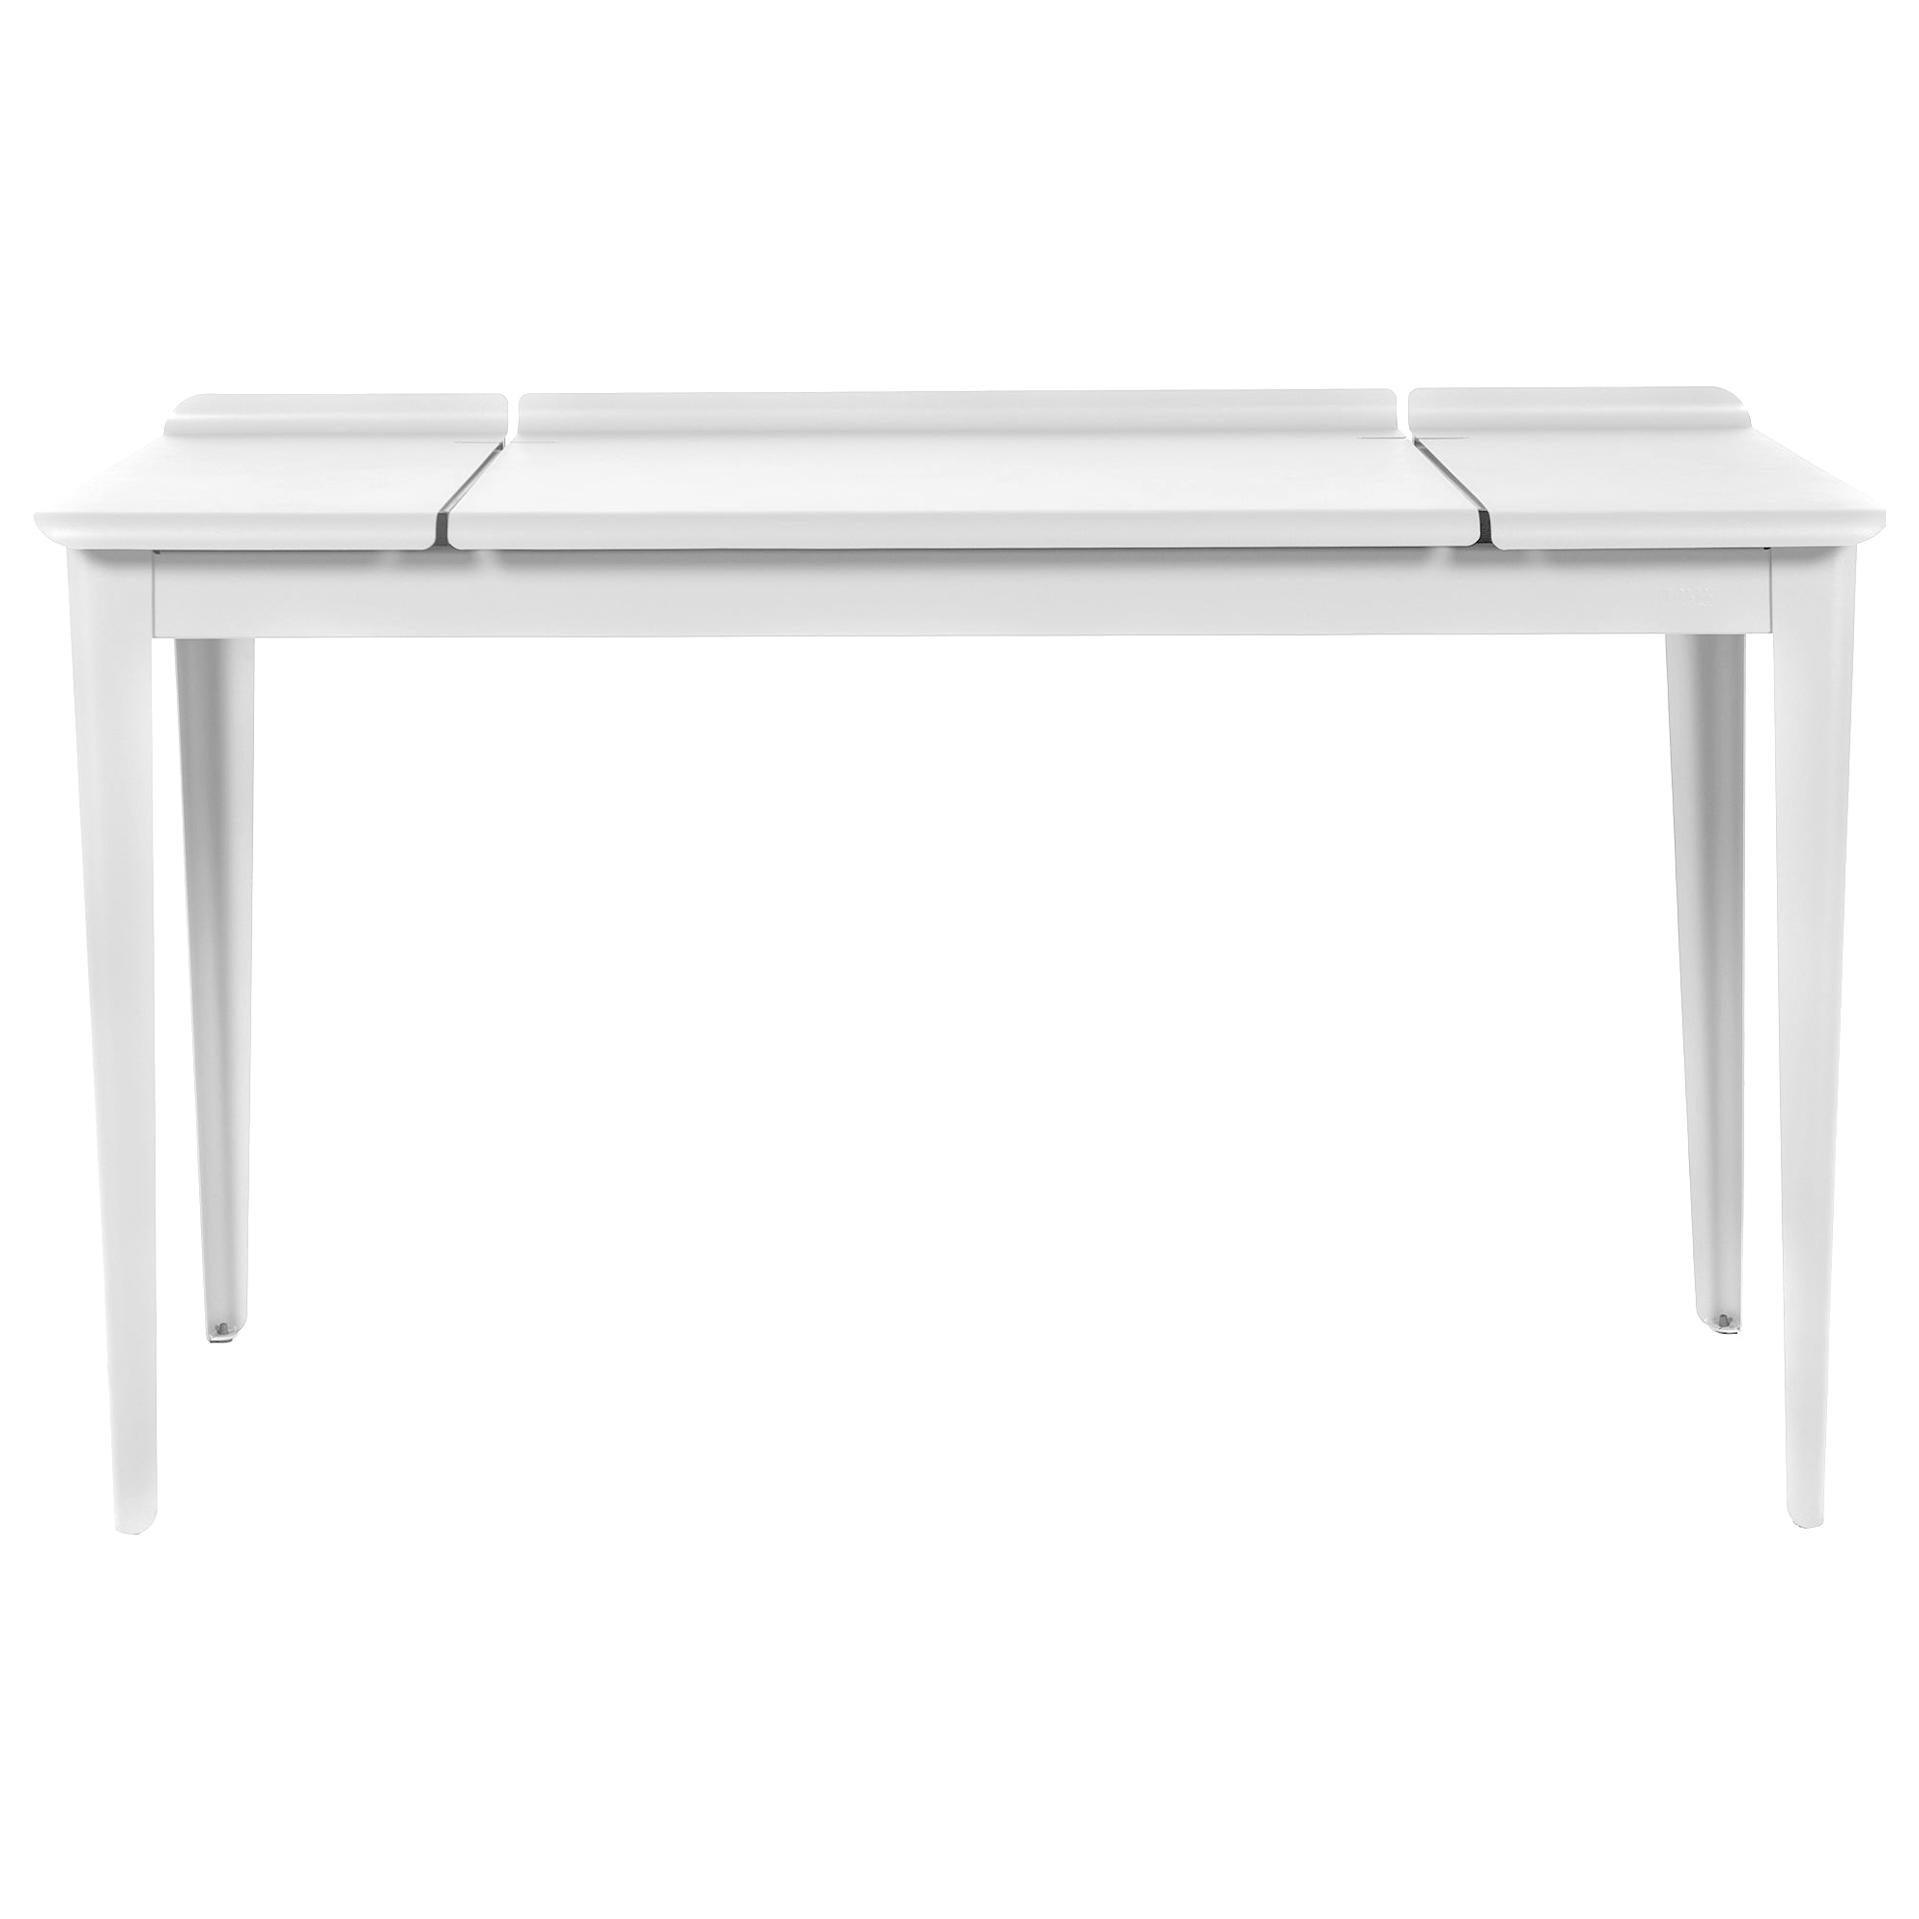 Large Flap Desk 60x130 in Essential Colors by Sebastian Berge Tolix